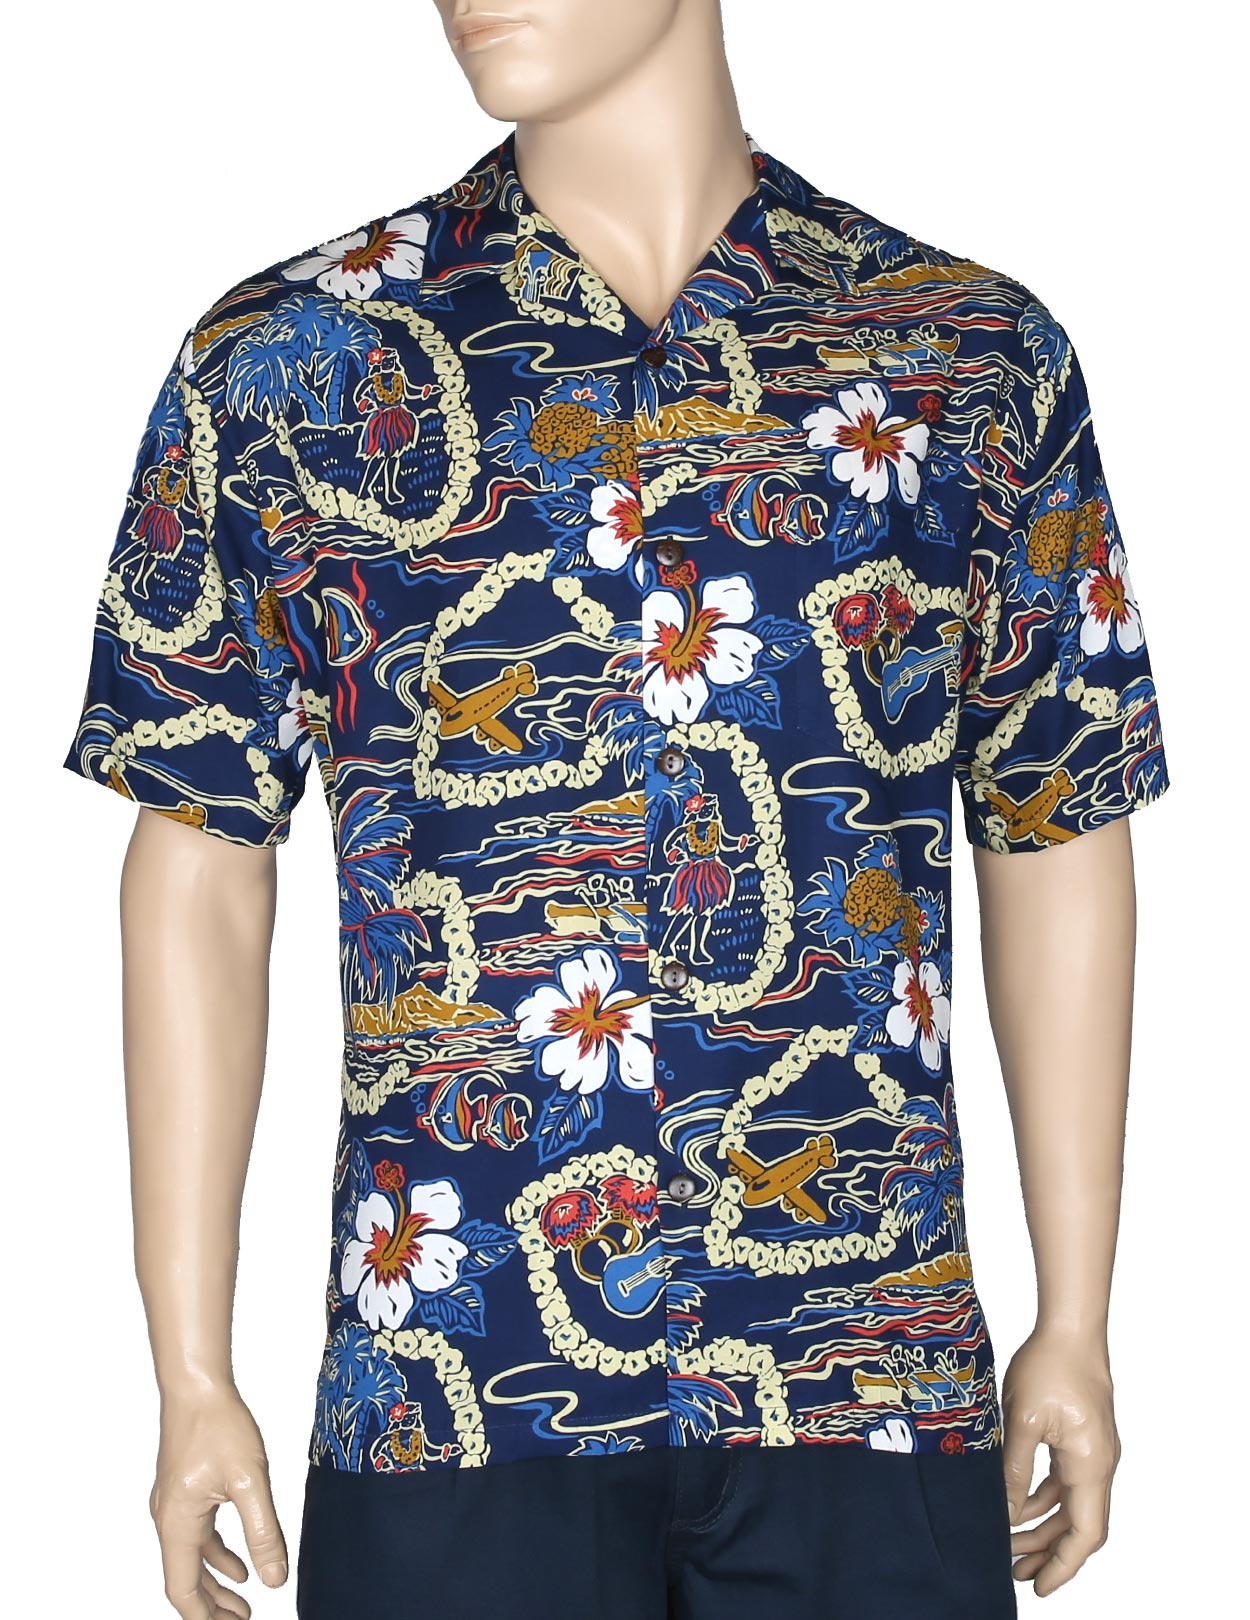 3b0bd7e5 Plus Size Hawaiian Shirts and Clothing - Shaka Time Hawaii